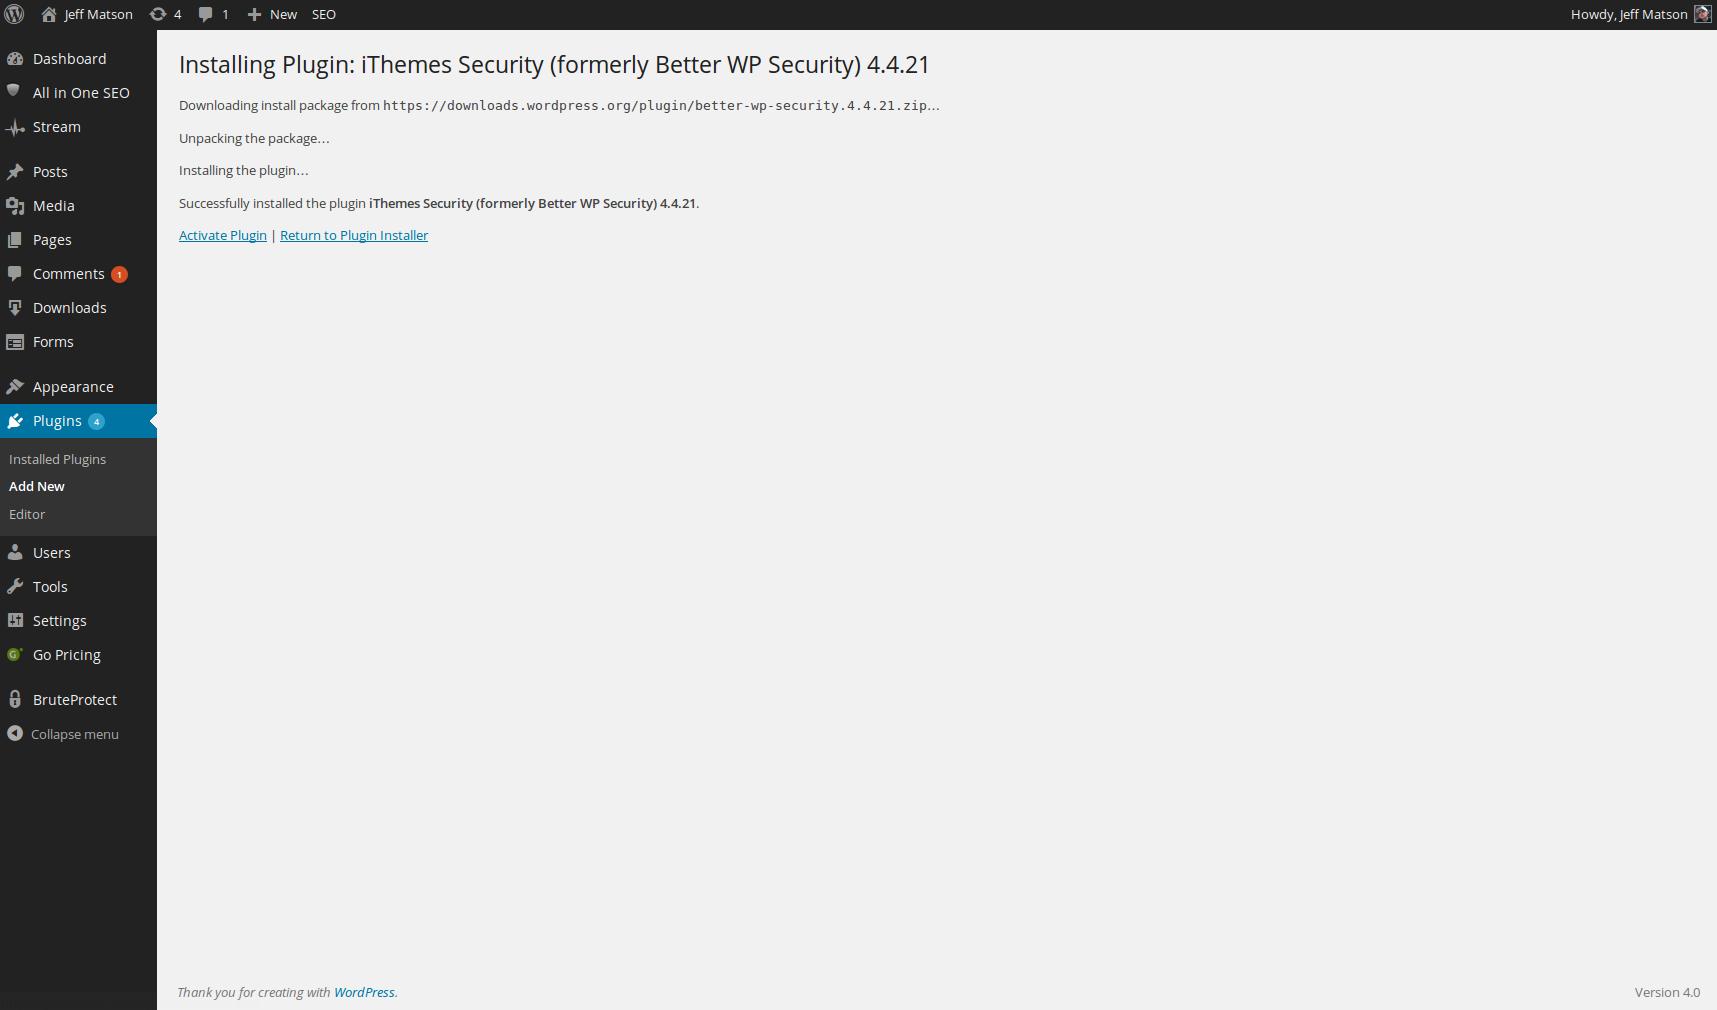 wordpress plugins install ithemes security 4